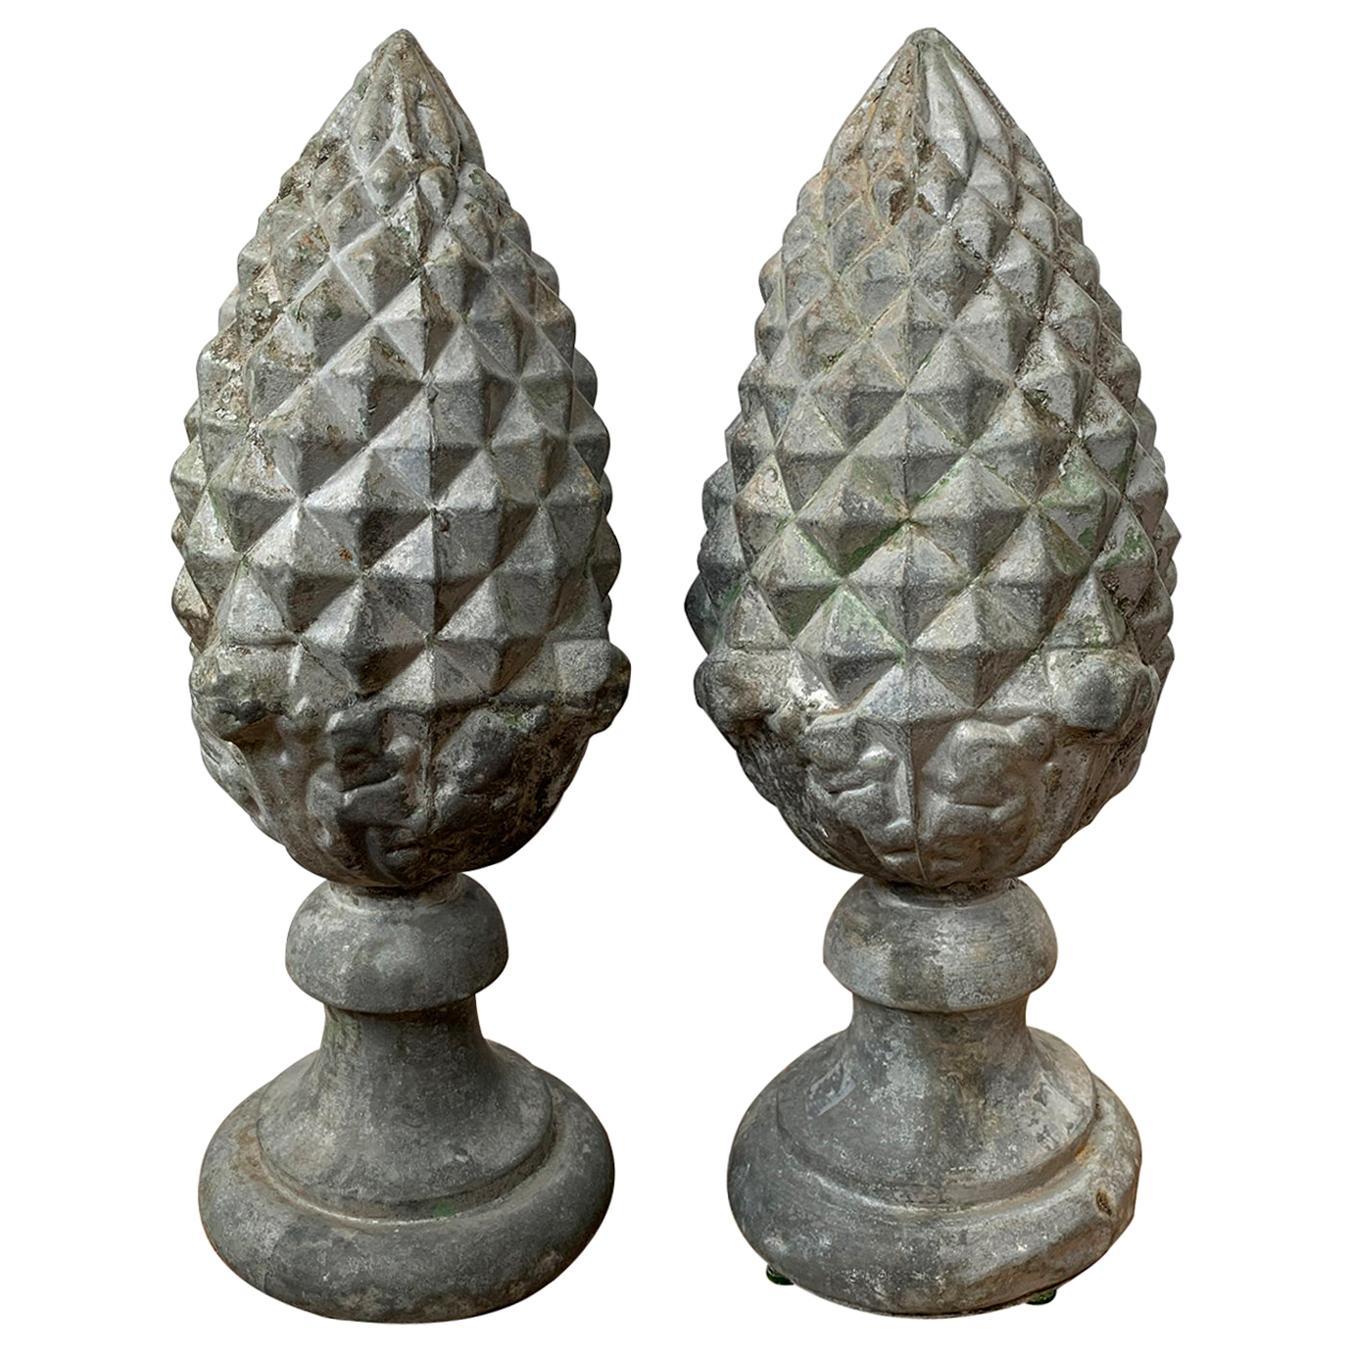 Pair of 19th-20th Century Zinc Pineapple Finials